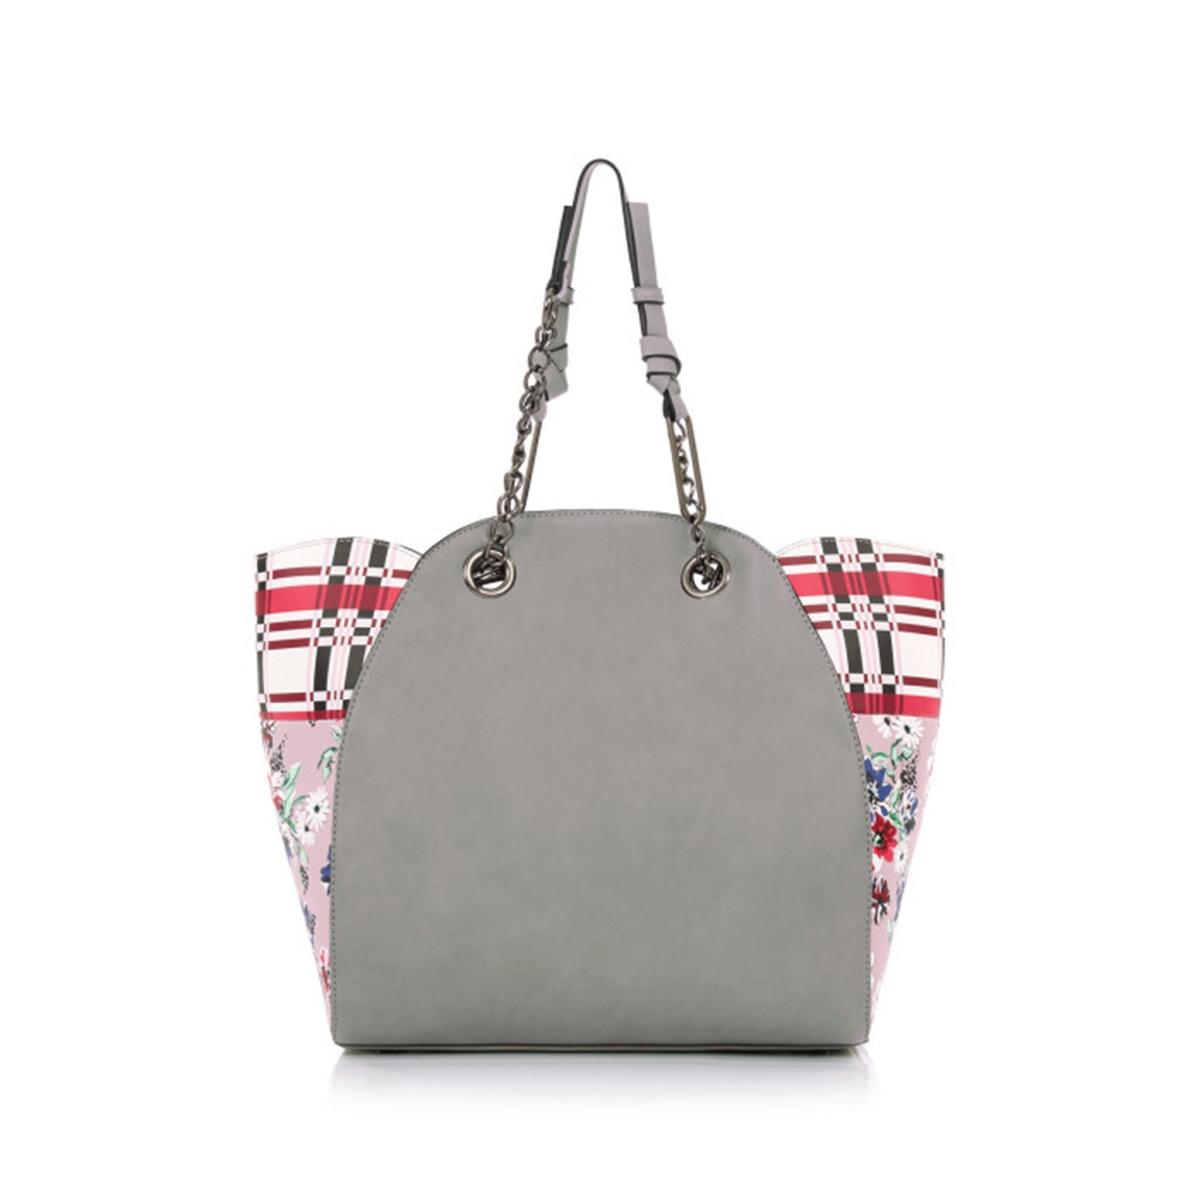 61fae86525e Τσάντα Ώμου Με Αλυσίδα Le Pandorine Classic Istruzioni DBG02332 Γκρι